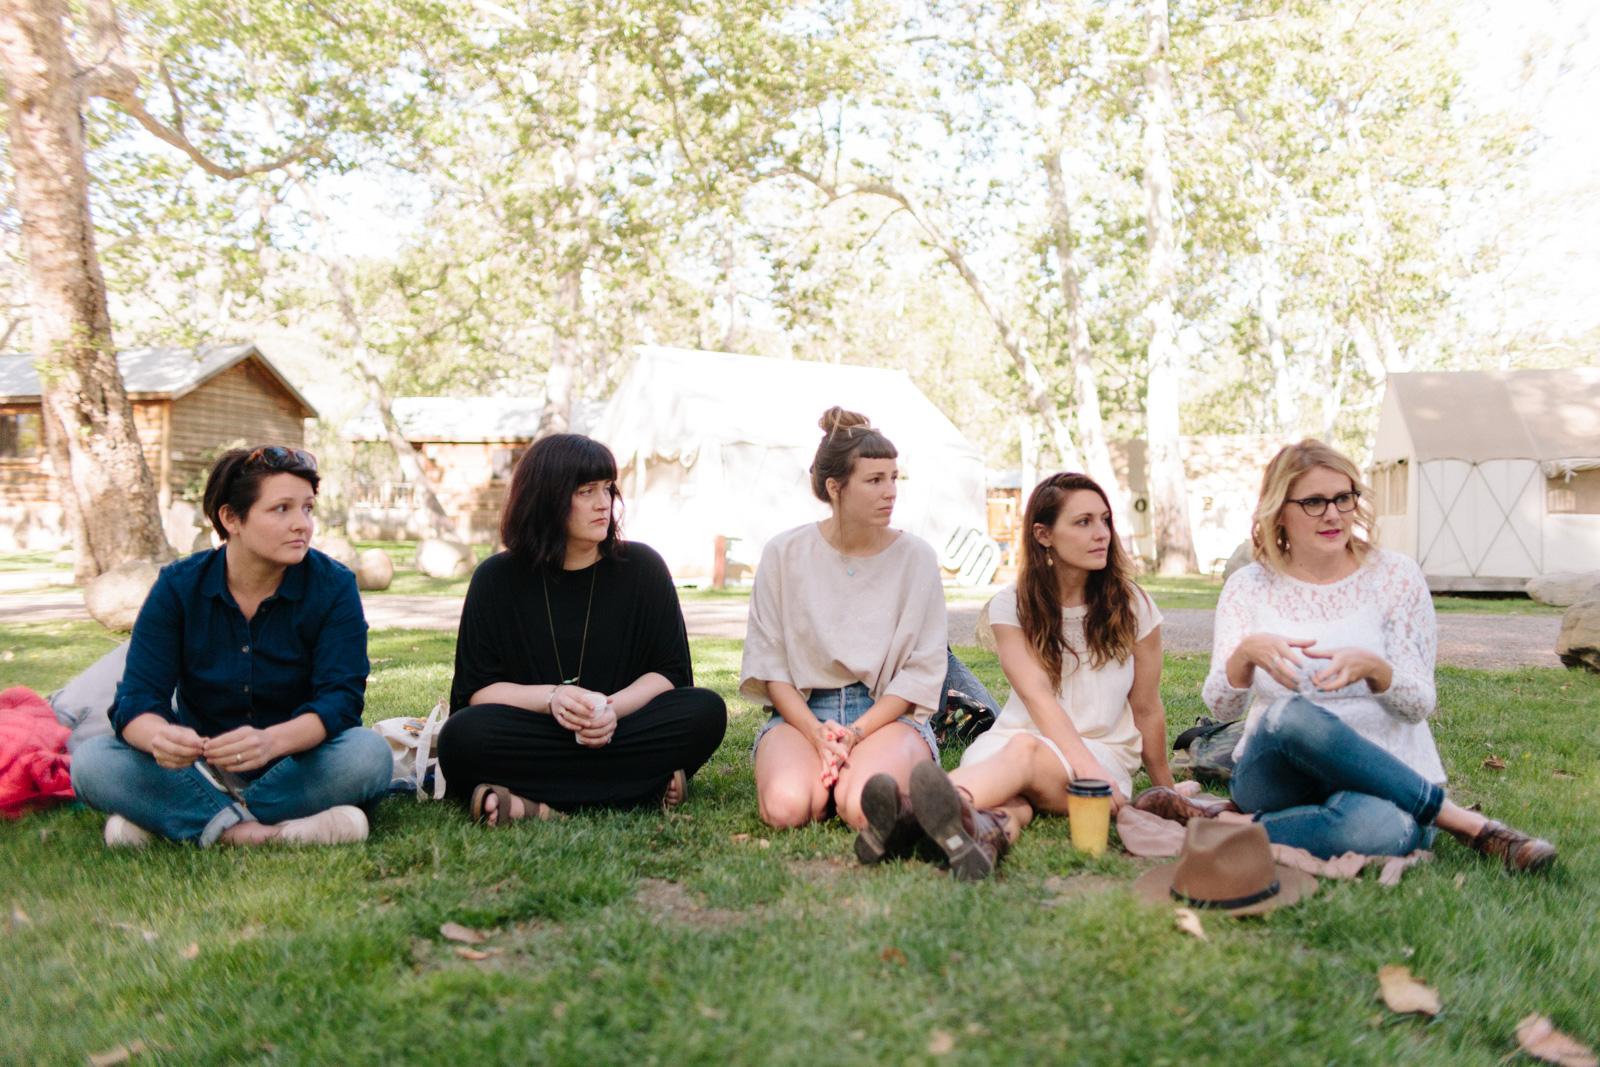 family photography gurus: Brooke Schwab, Posy Quarterman, Yan Palmer, Becky Earl, and Kristin Rogers.